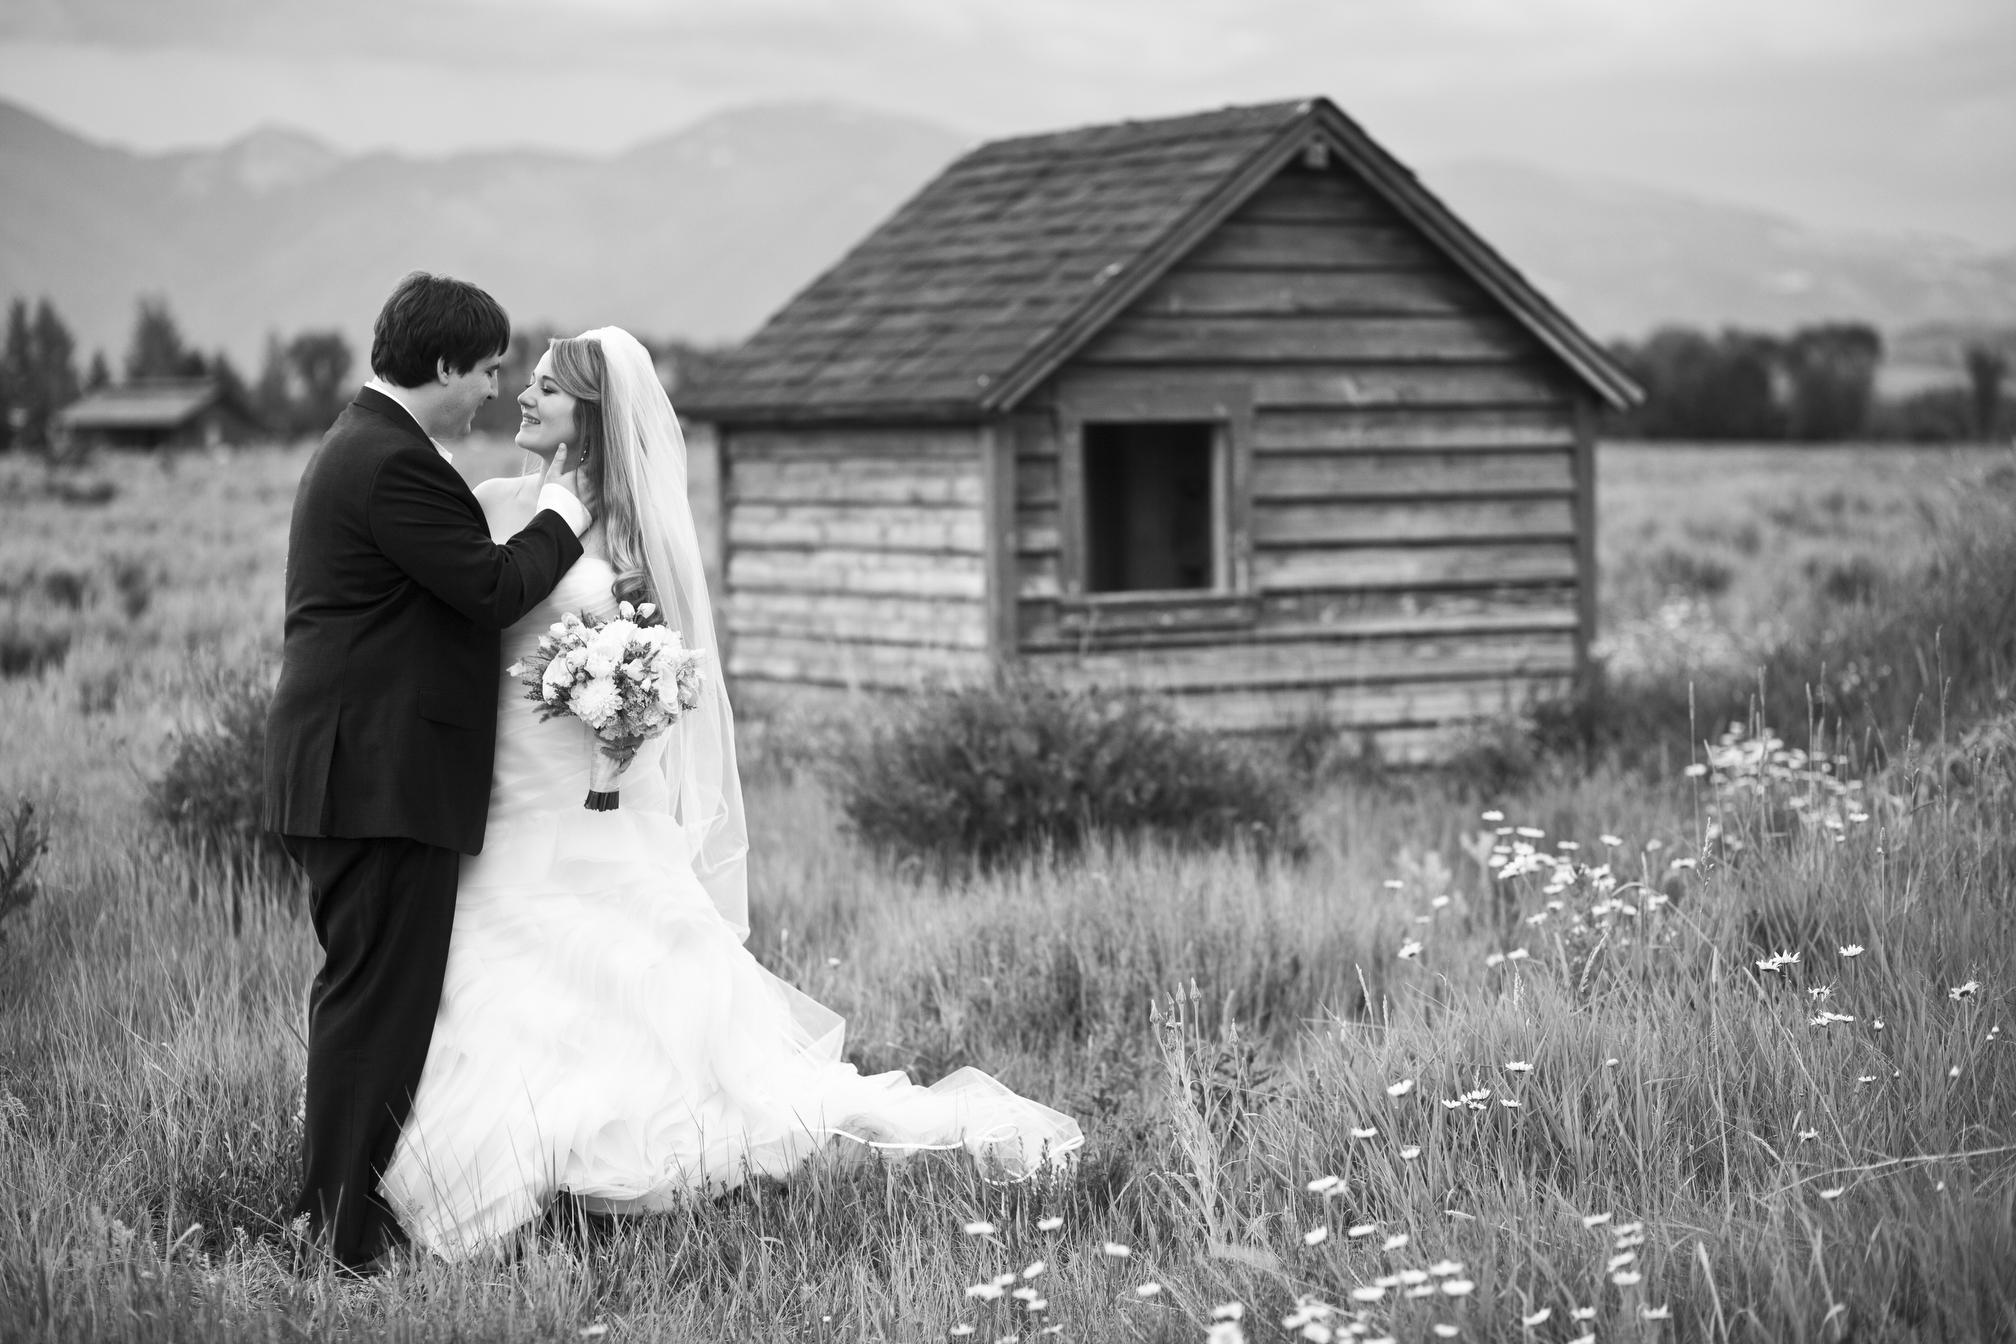 Watts Jackson Hole Wedding 2012_1087.JPG